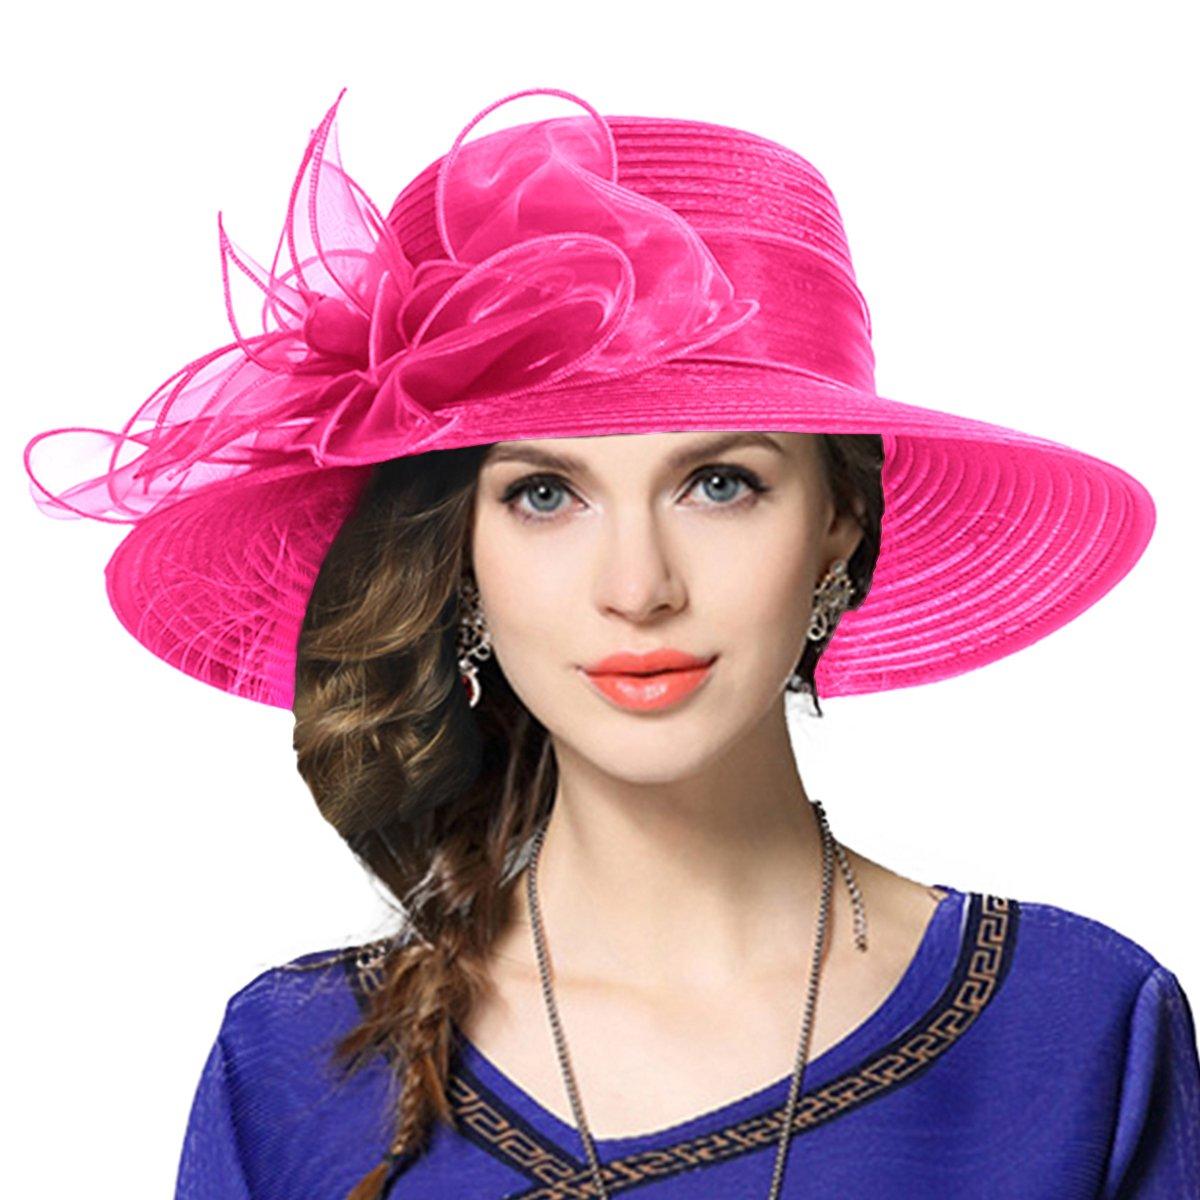 Leafpink VECRY Kentucky Derby Dress Church Cloche Hat Sweet Cute Floral Bucket Hat